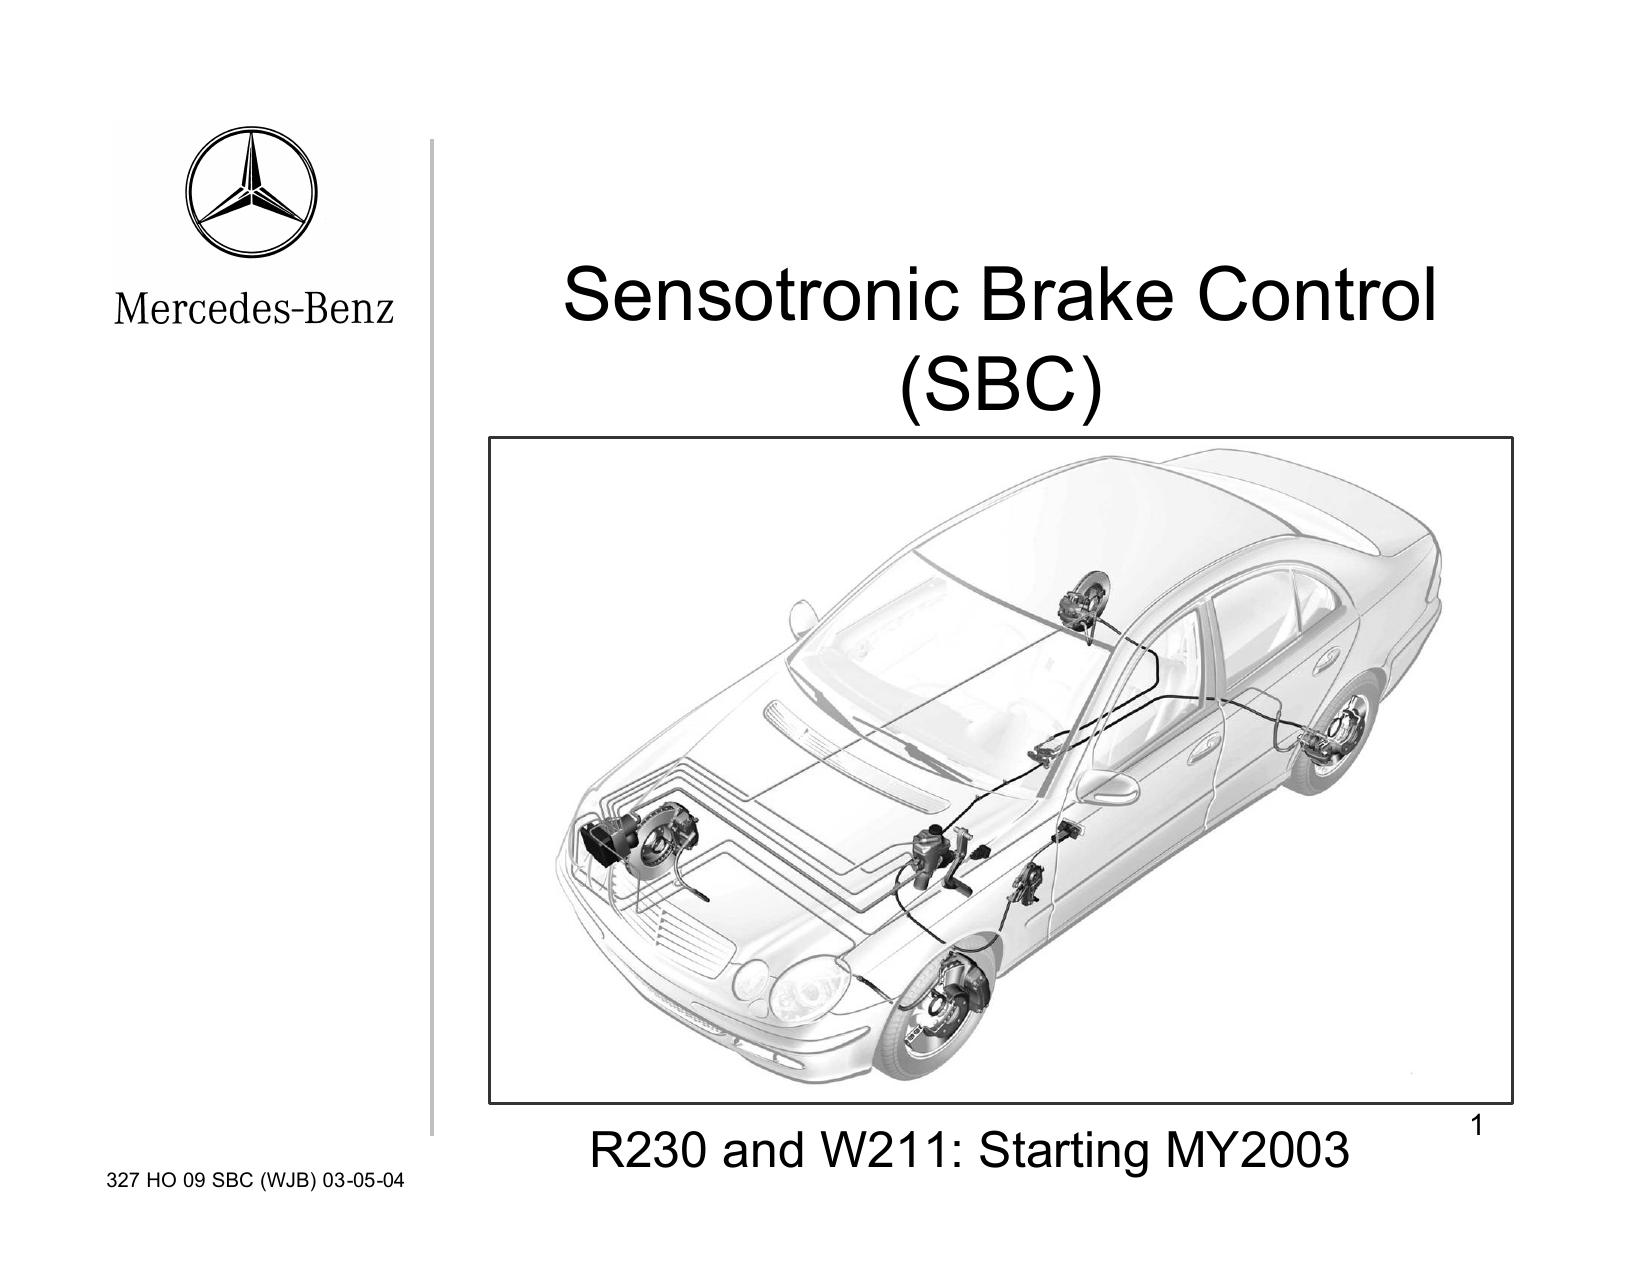 senotronic braking system